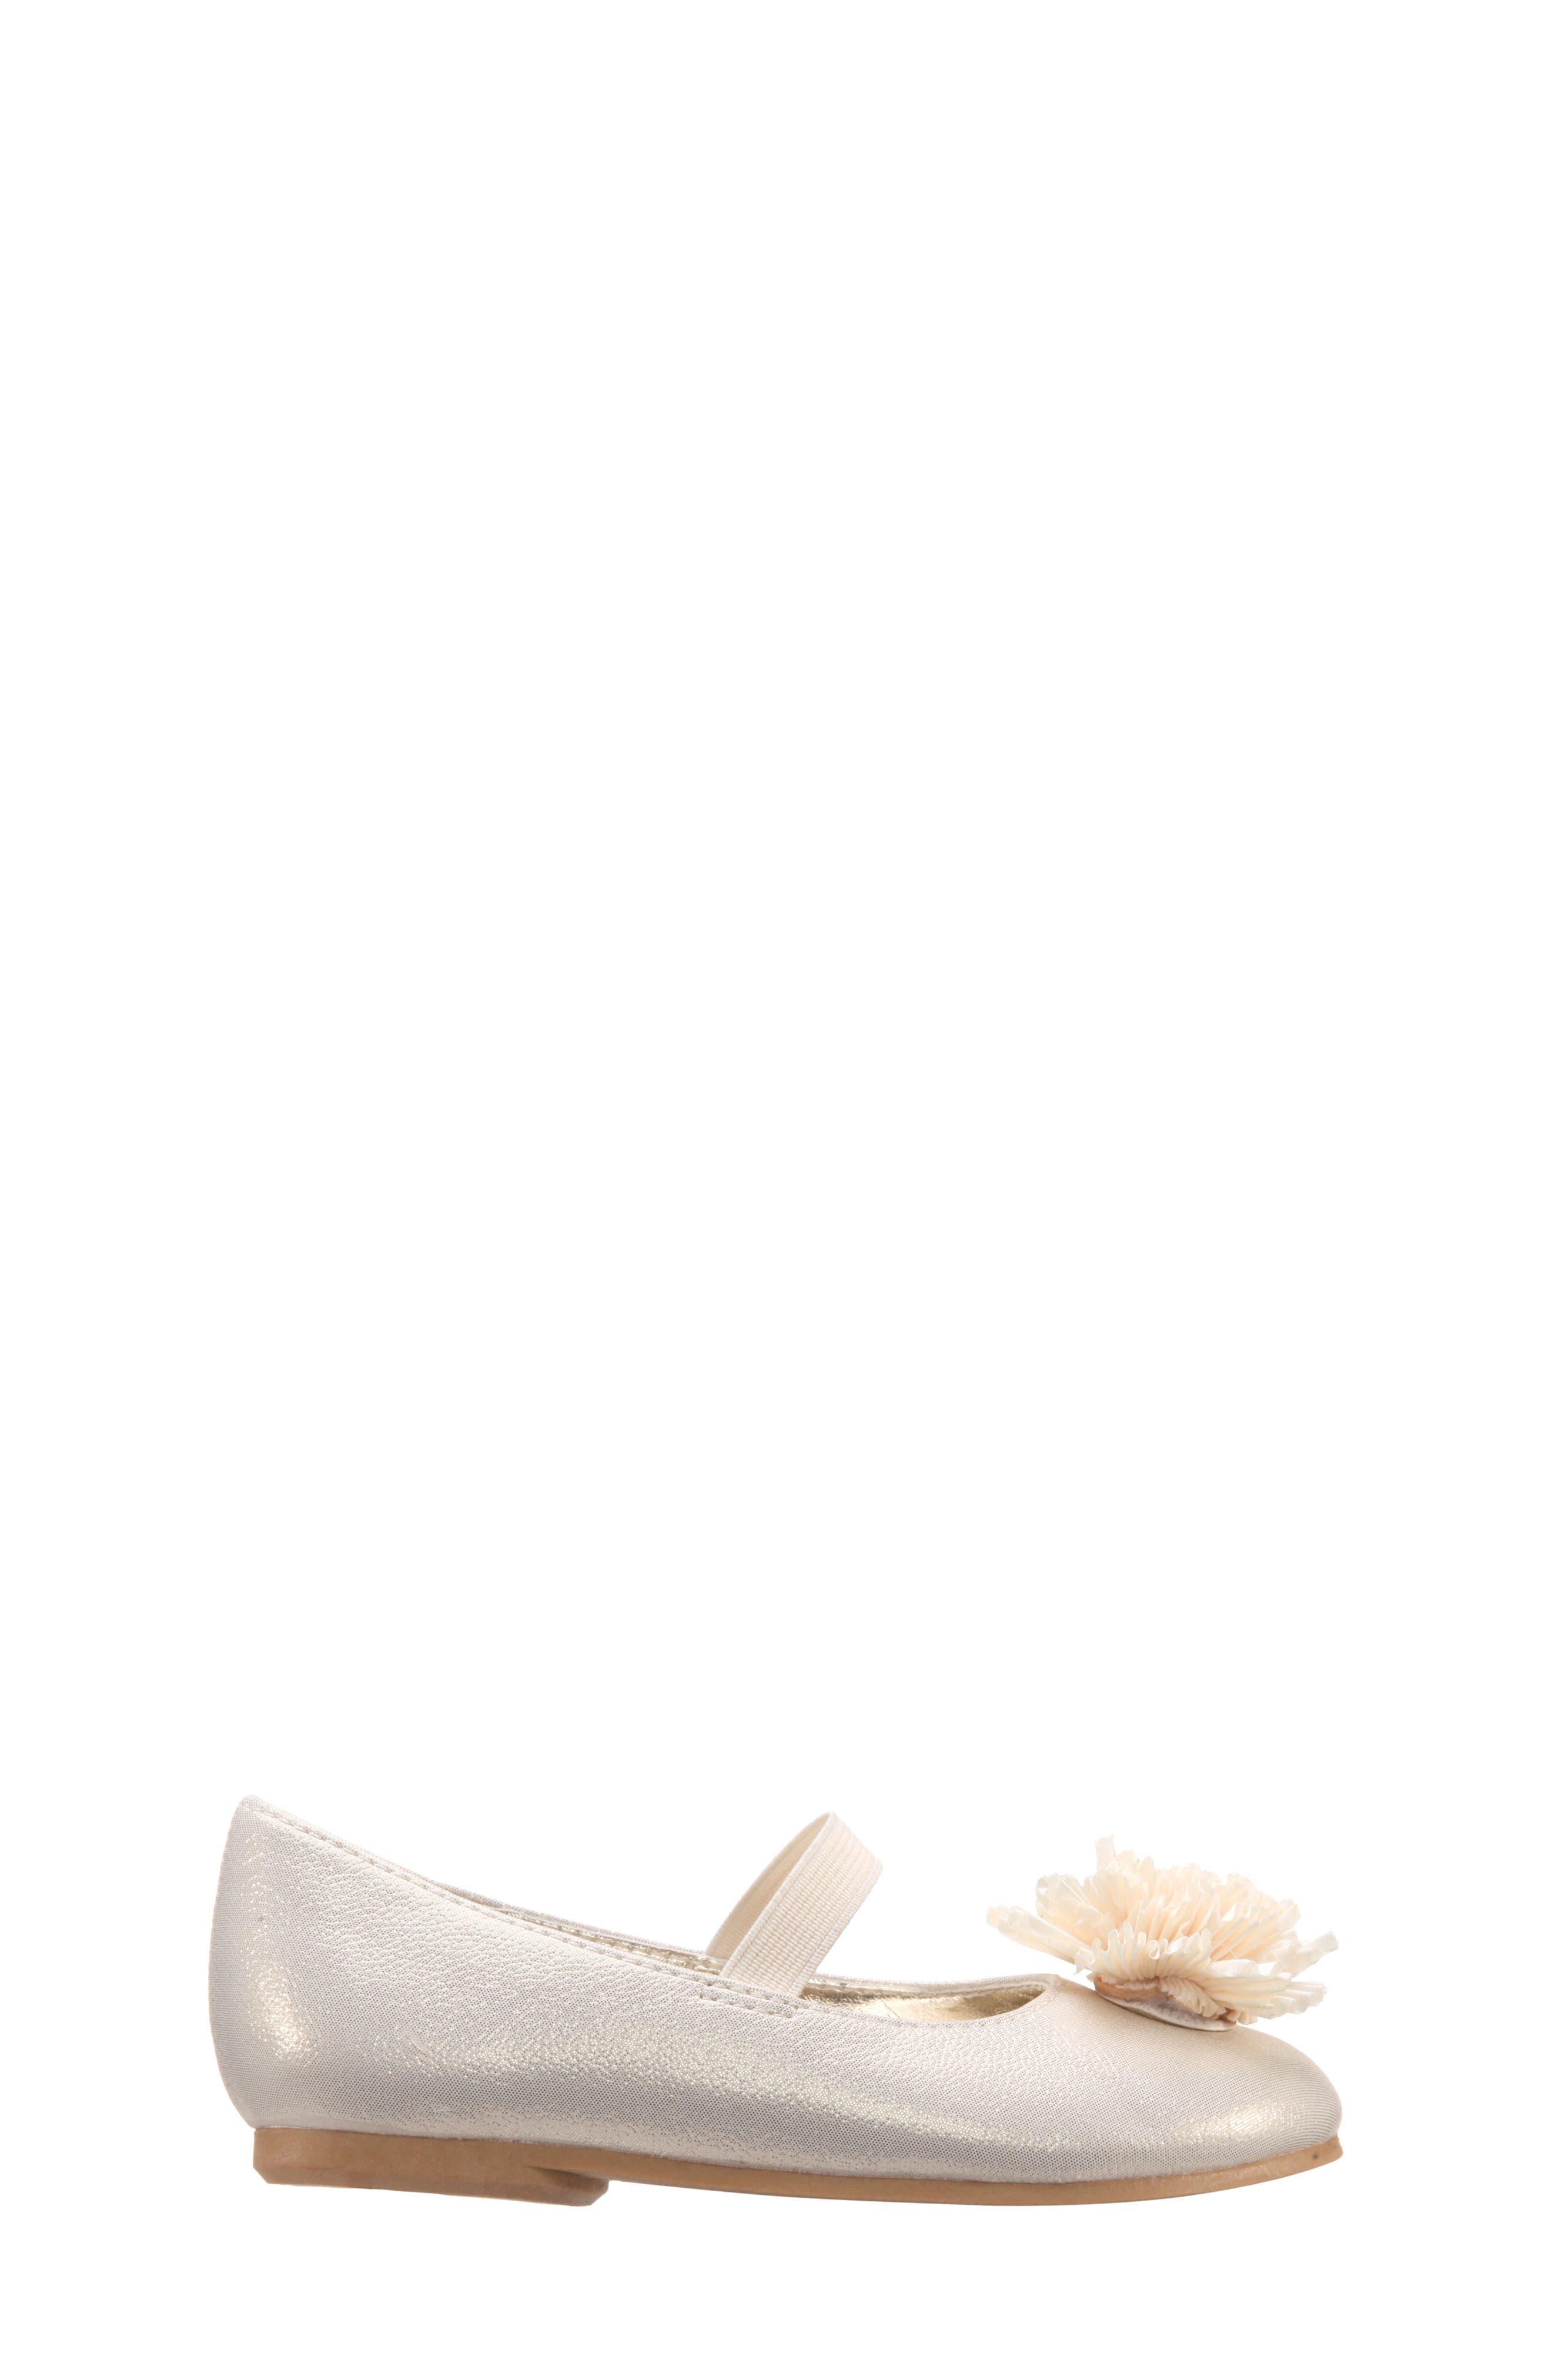 Jemma-T Bow Ballet Flat,                             Alternate thumbnail 3, color,                             040